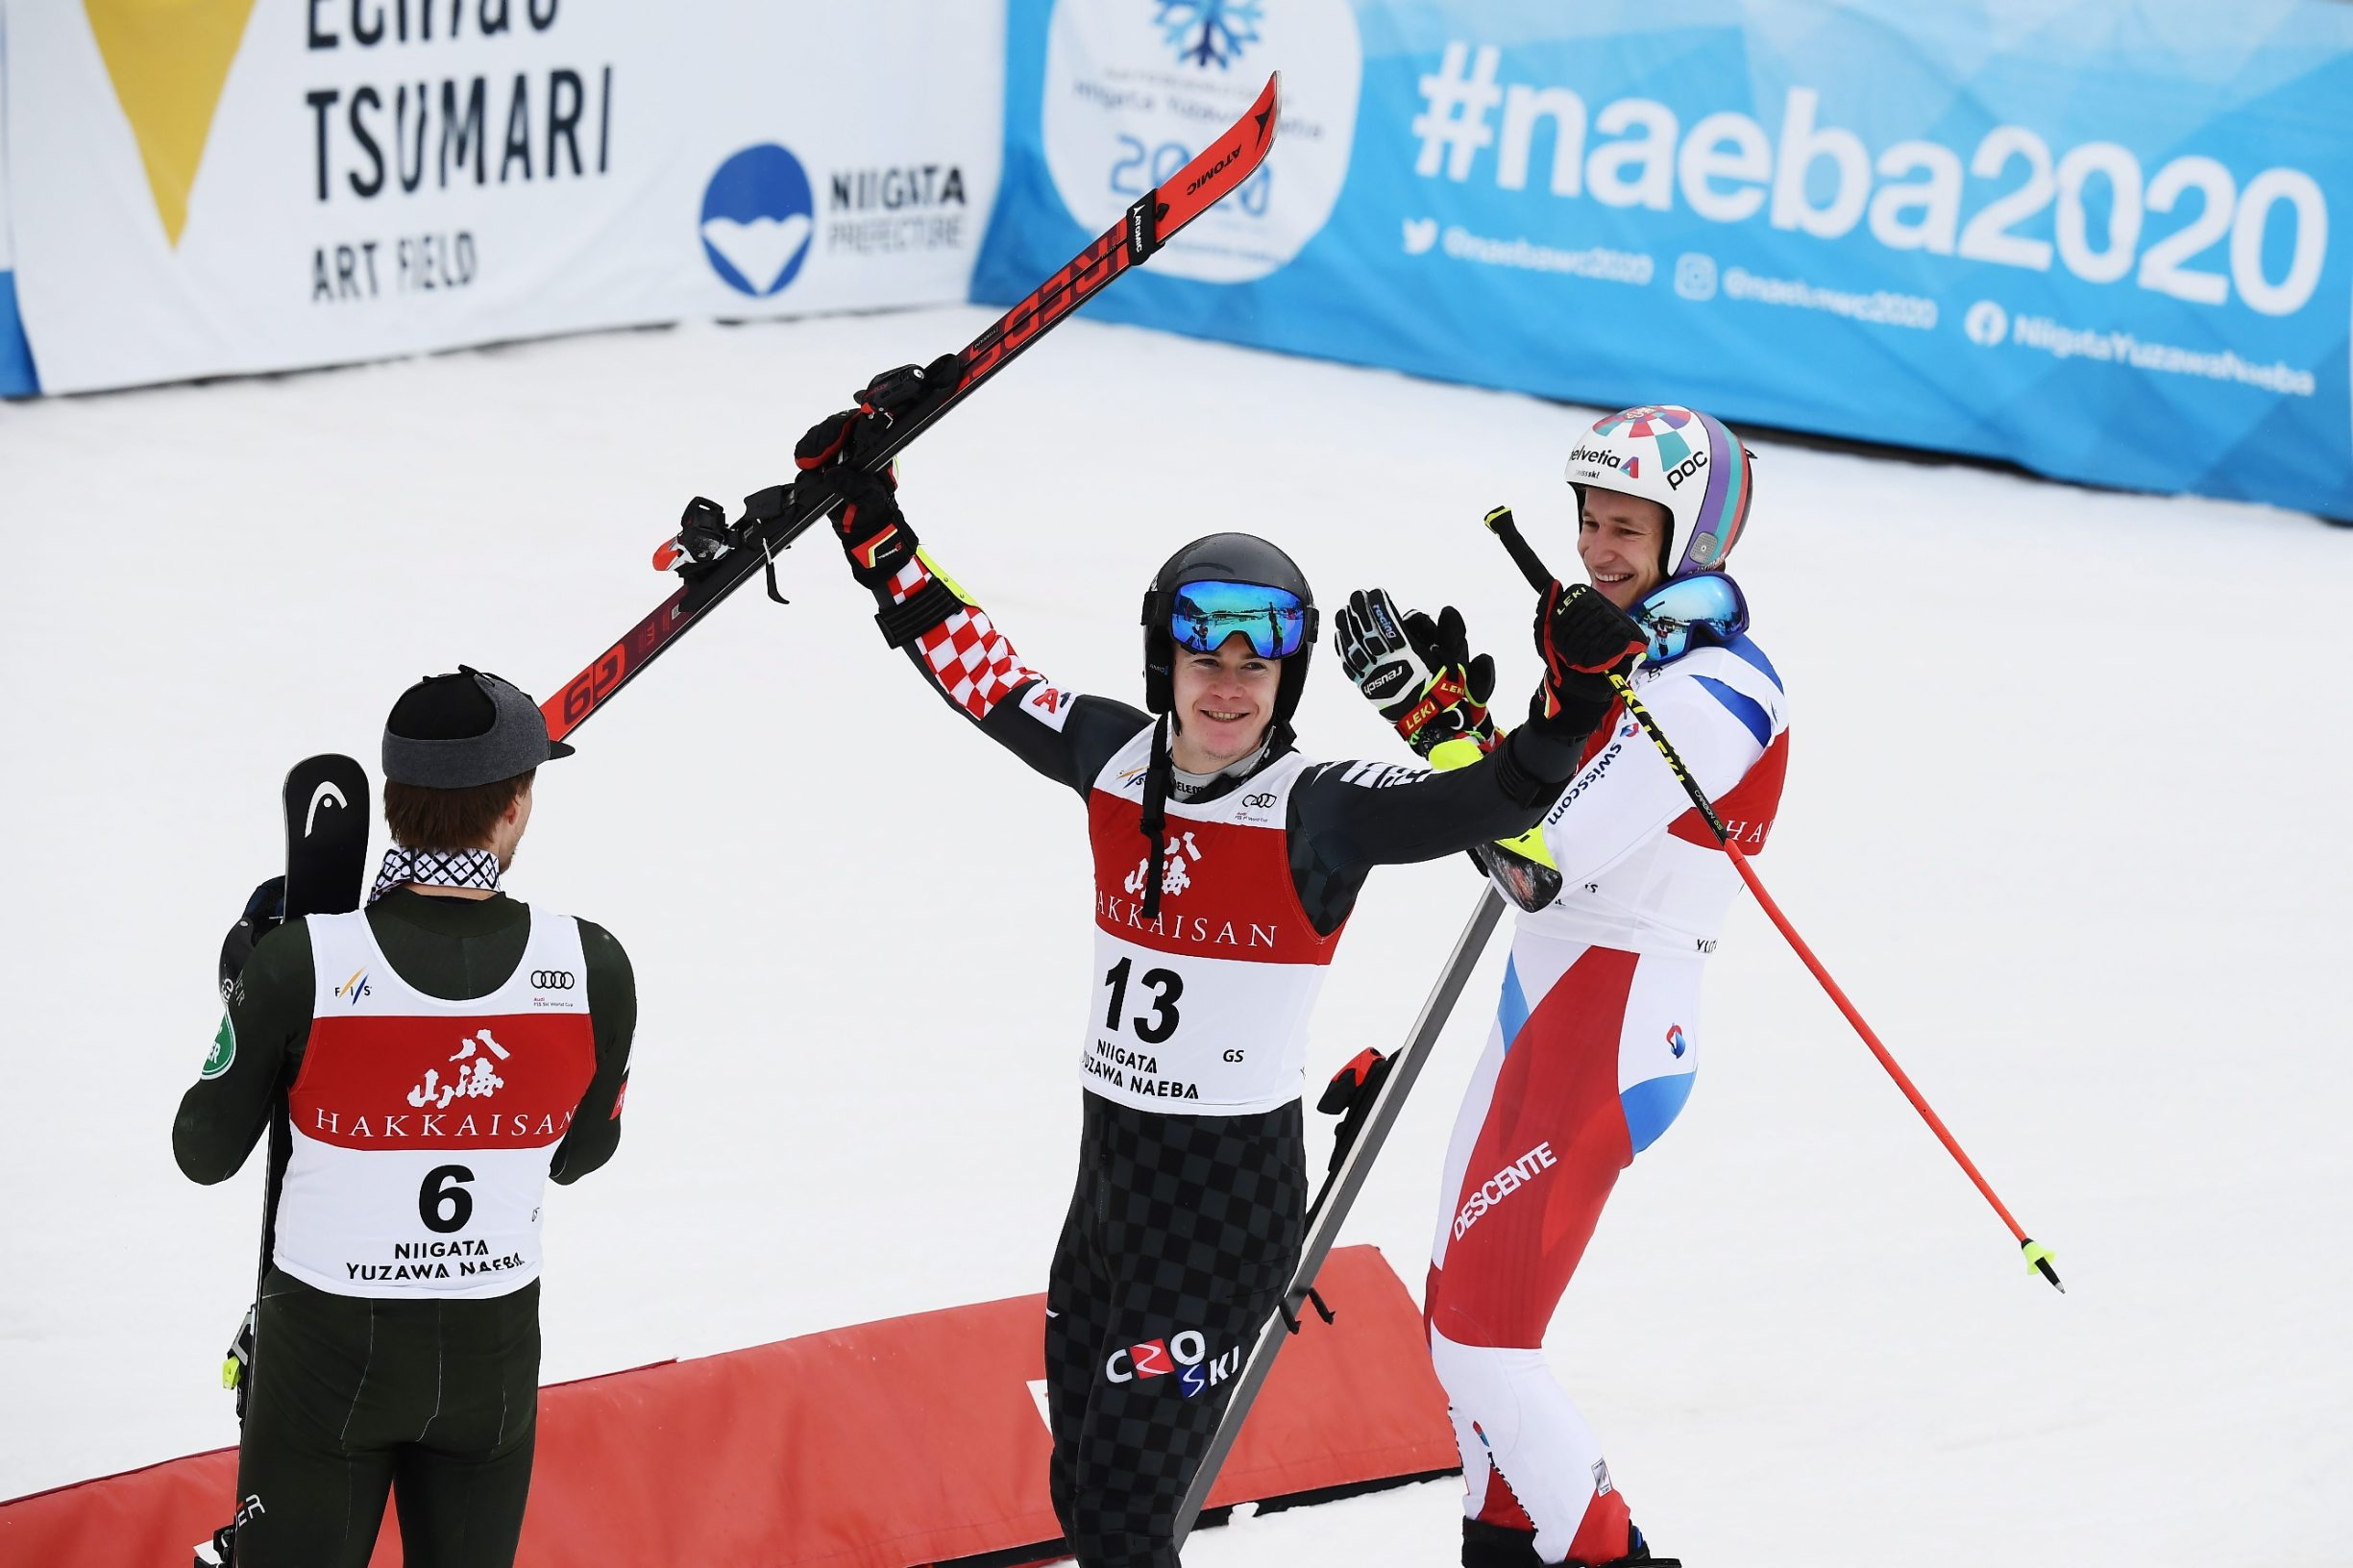 Filip Zubcic of Croatia (C) celebrates the win of the Audi FIS Alpine Ski World Cup Men's Giant Slalom on February 22, 2020 in Yuzawa Naeba, western Japan. (Photo by CHARLY TRIBALLEAU / AFP)